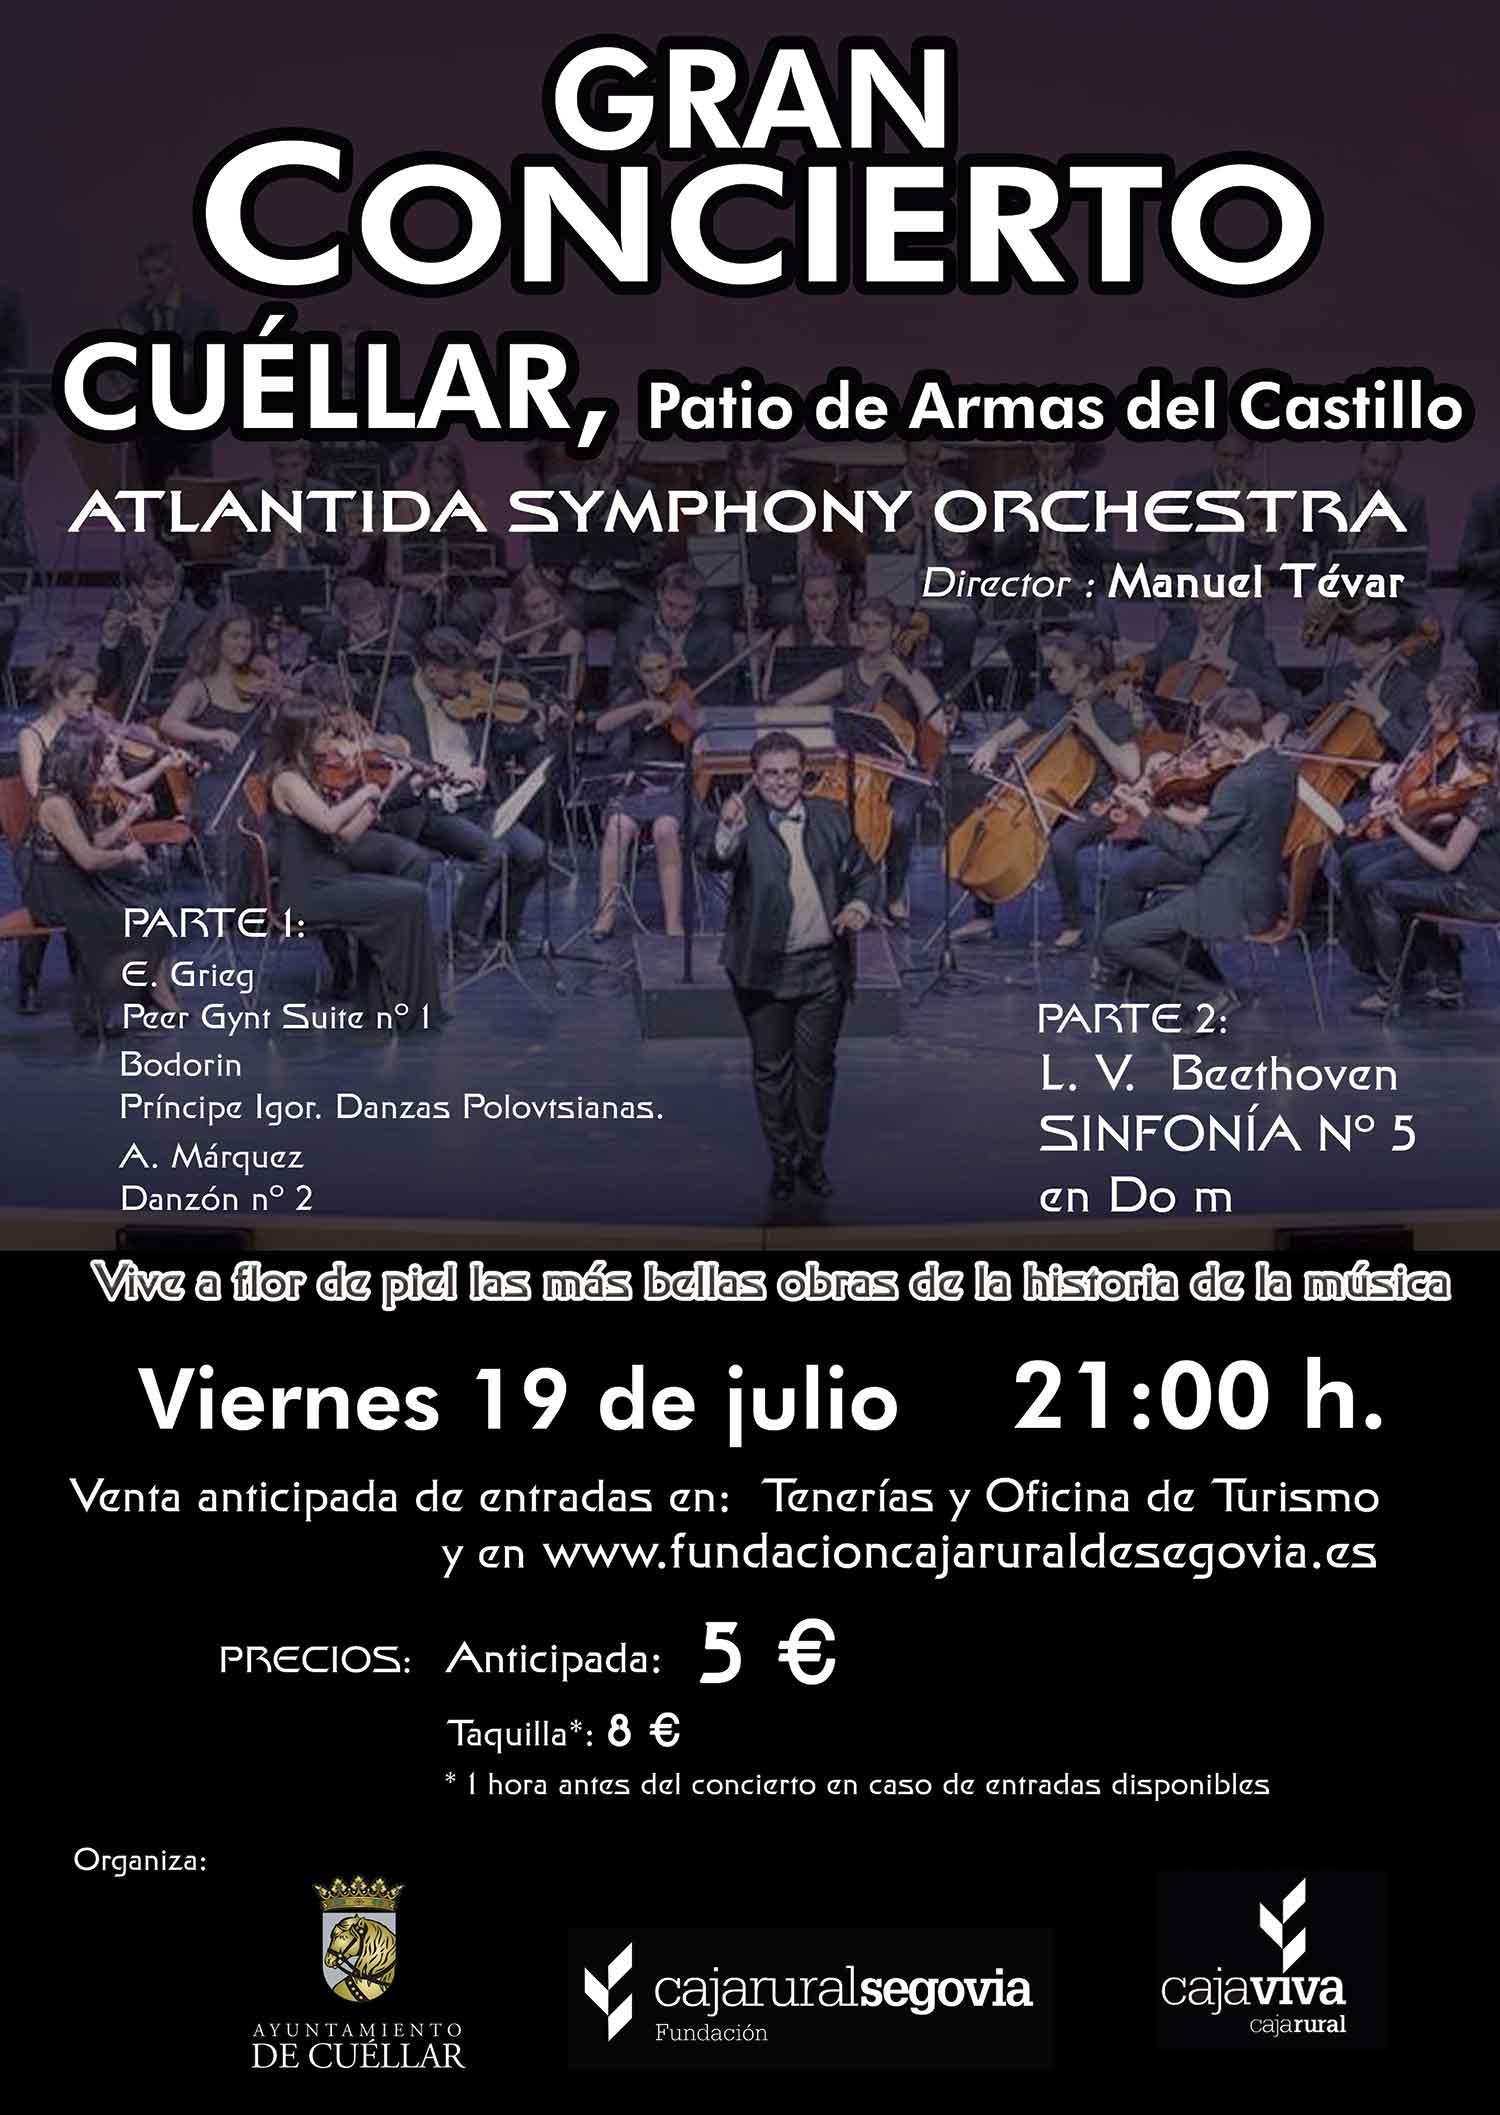 concert poster cuellar 2019